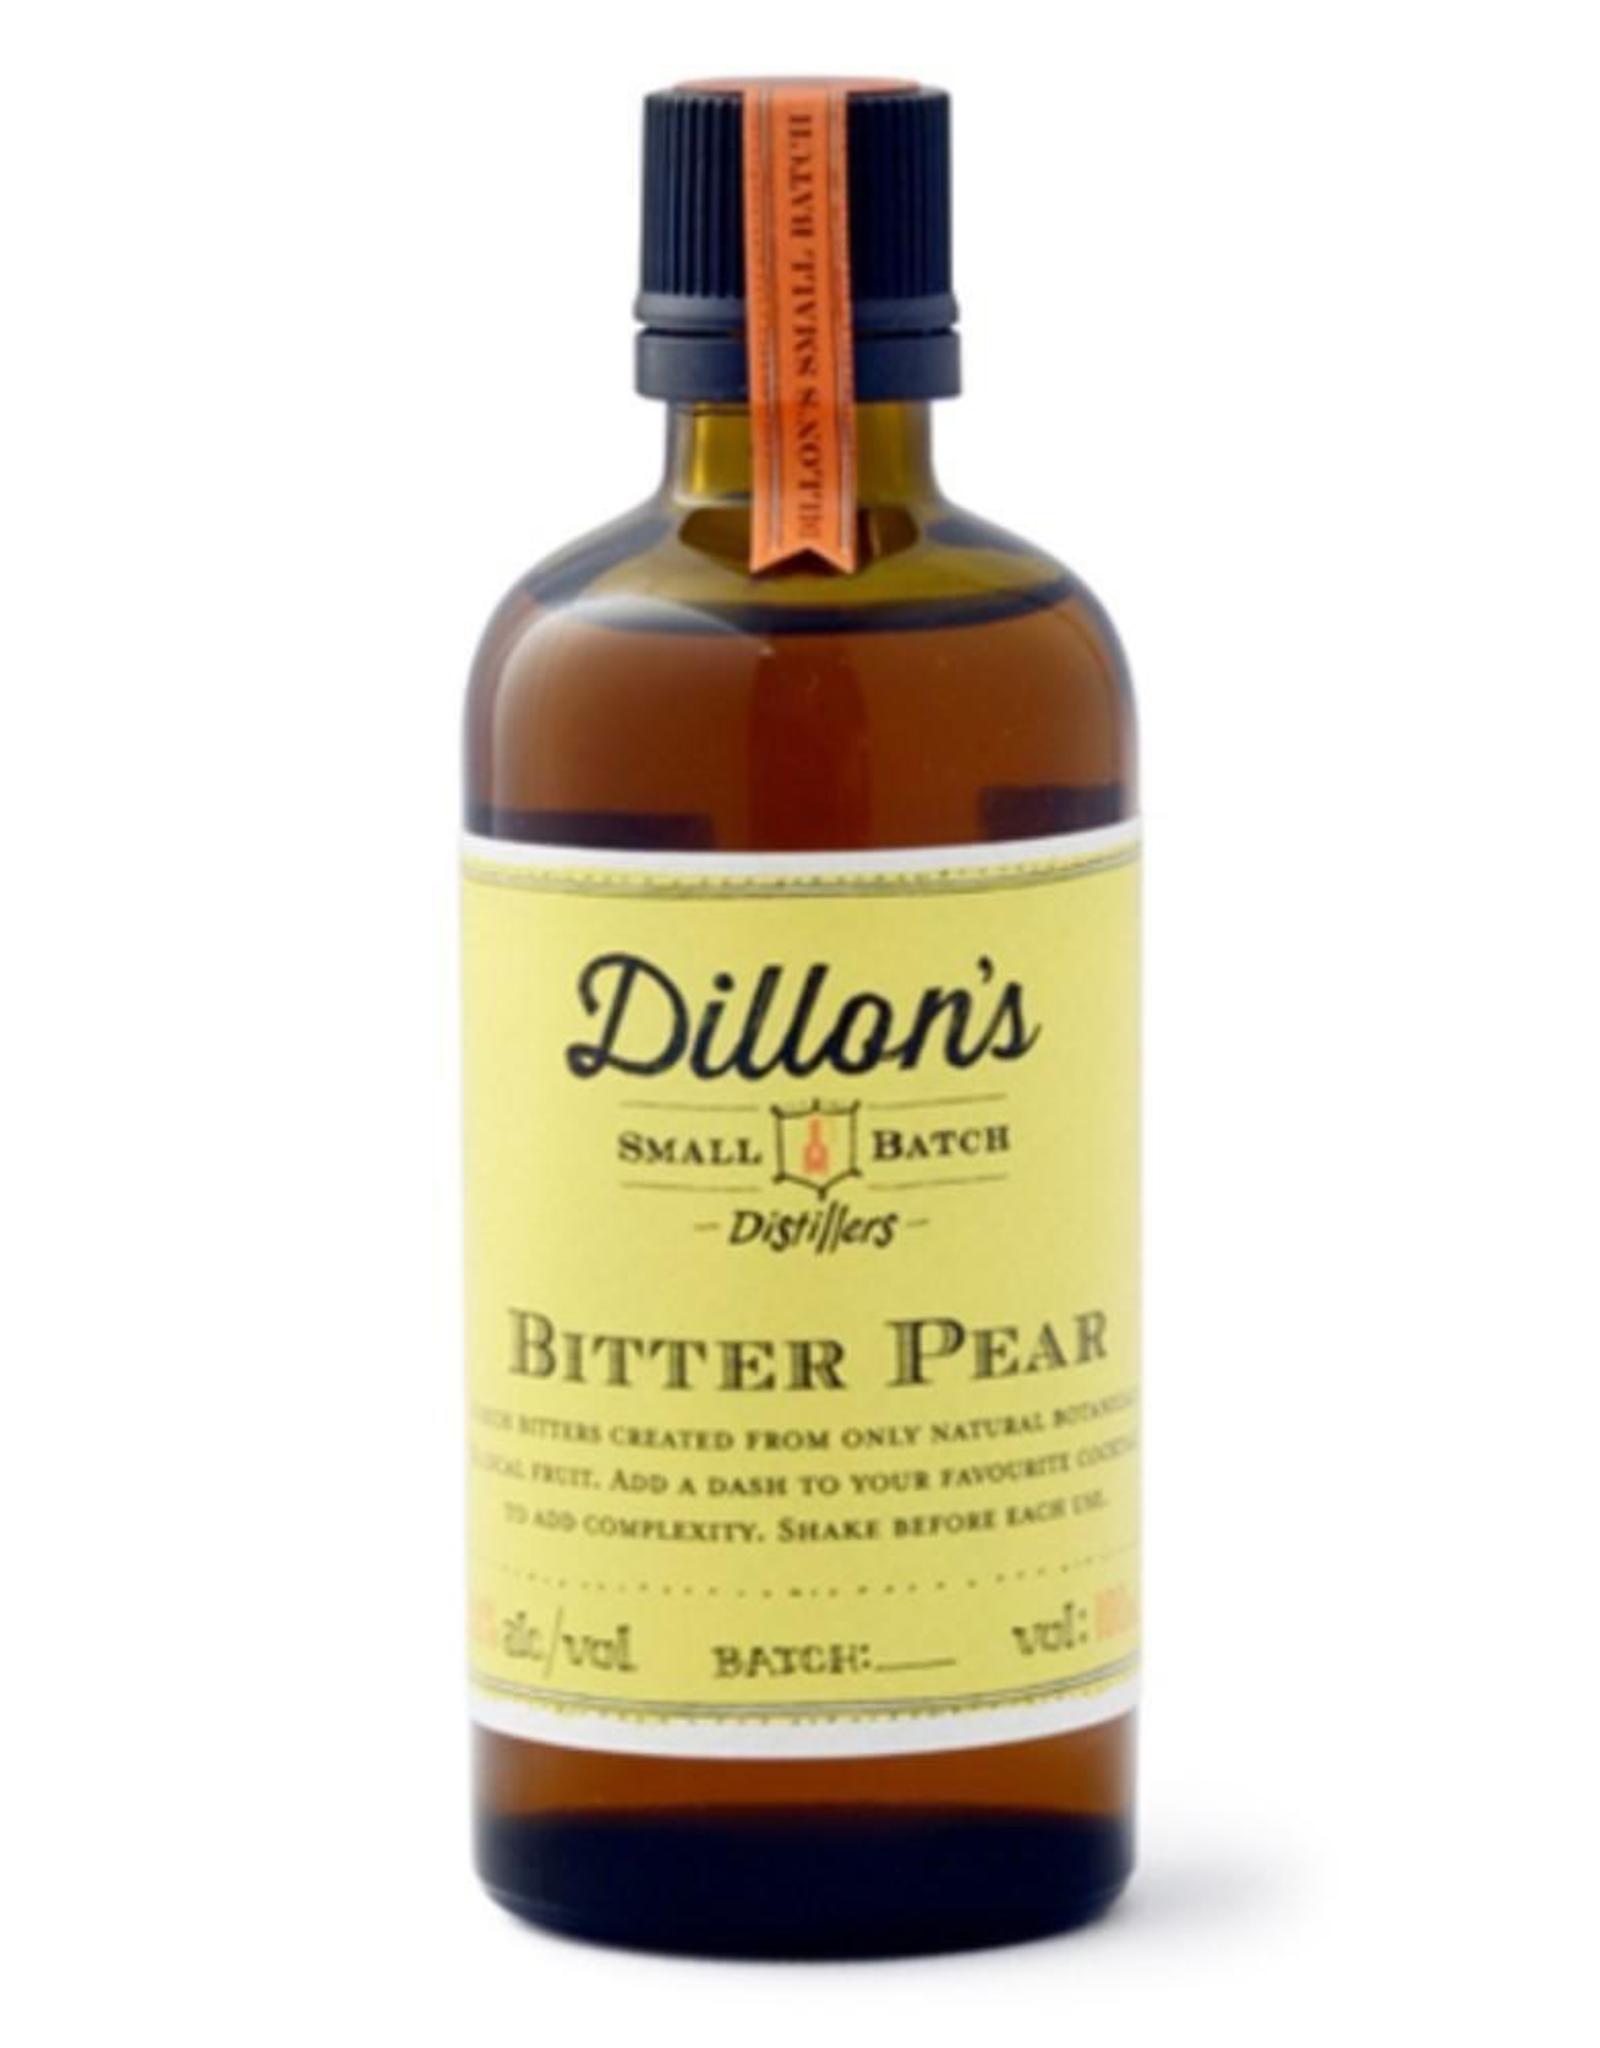 Bitters, Pear